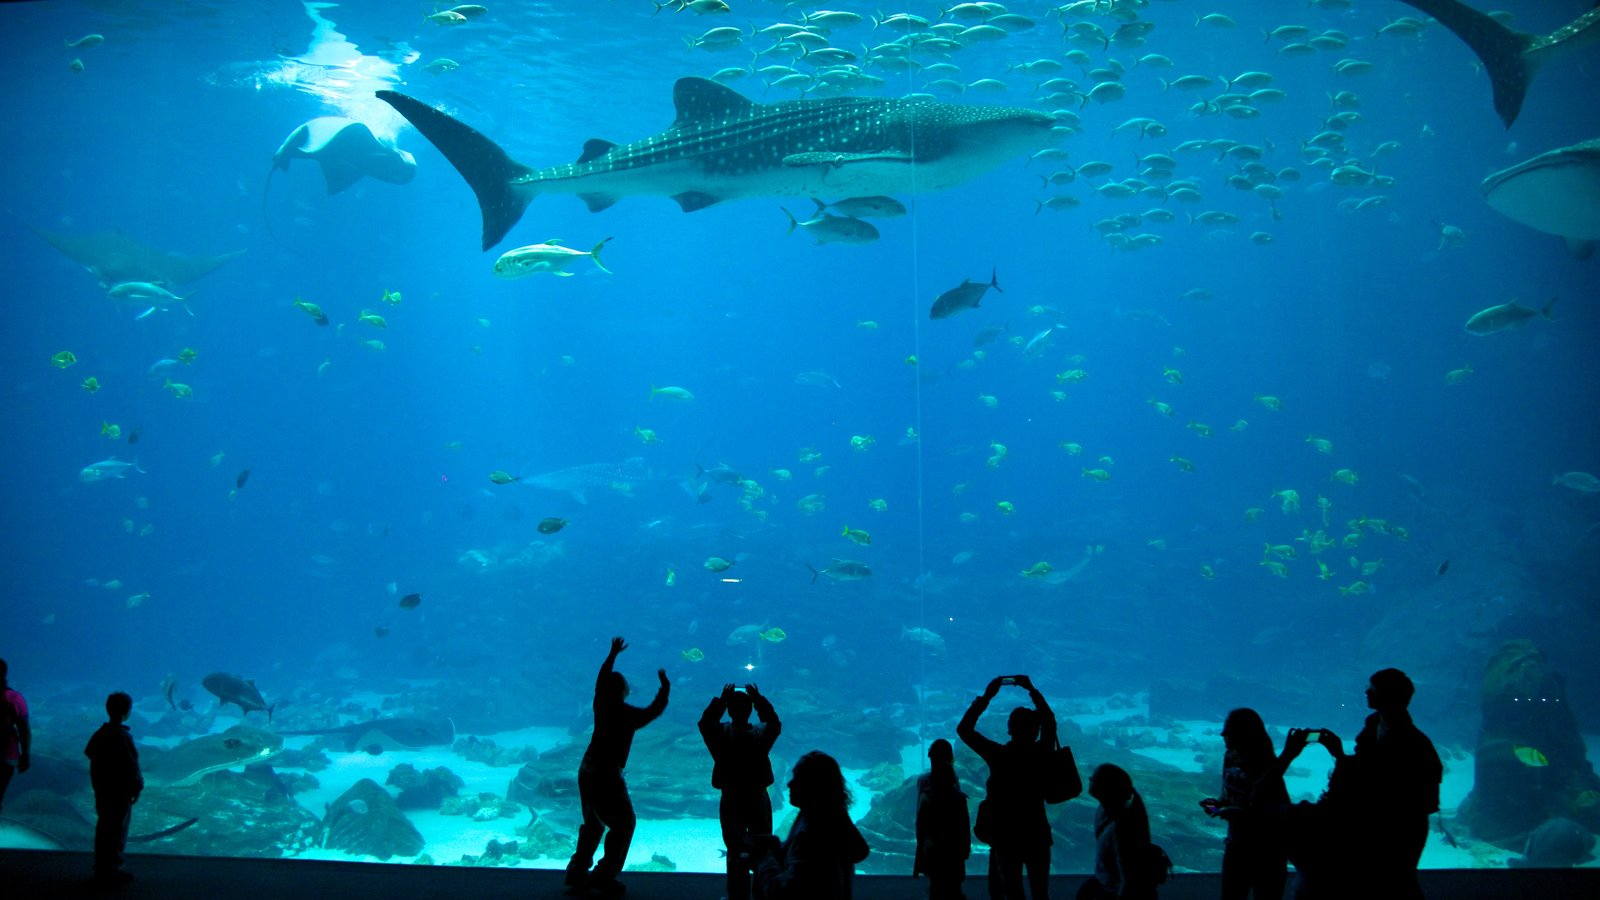 Atlanta caracterizando vida marinha e vistas internas